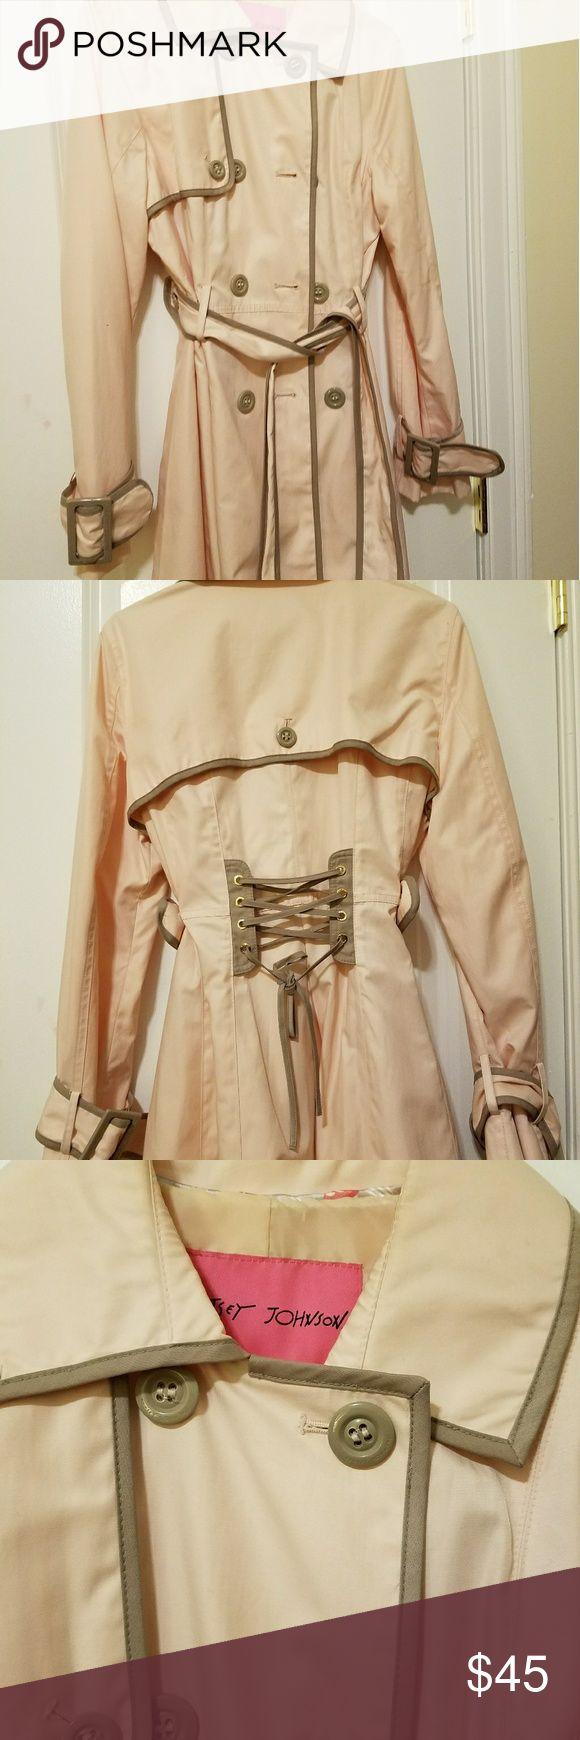 Light pink and gray Betsy Johnson raincoat Brand new, never worn, smoke free, no tags though Betsey Johnson Jackets & Coats Trench Coats